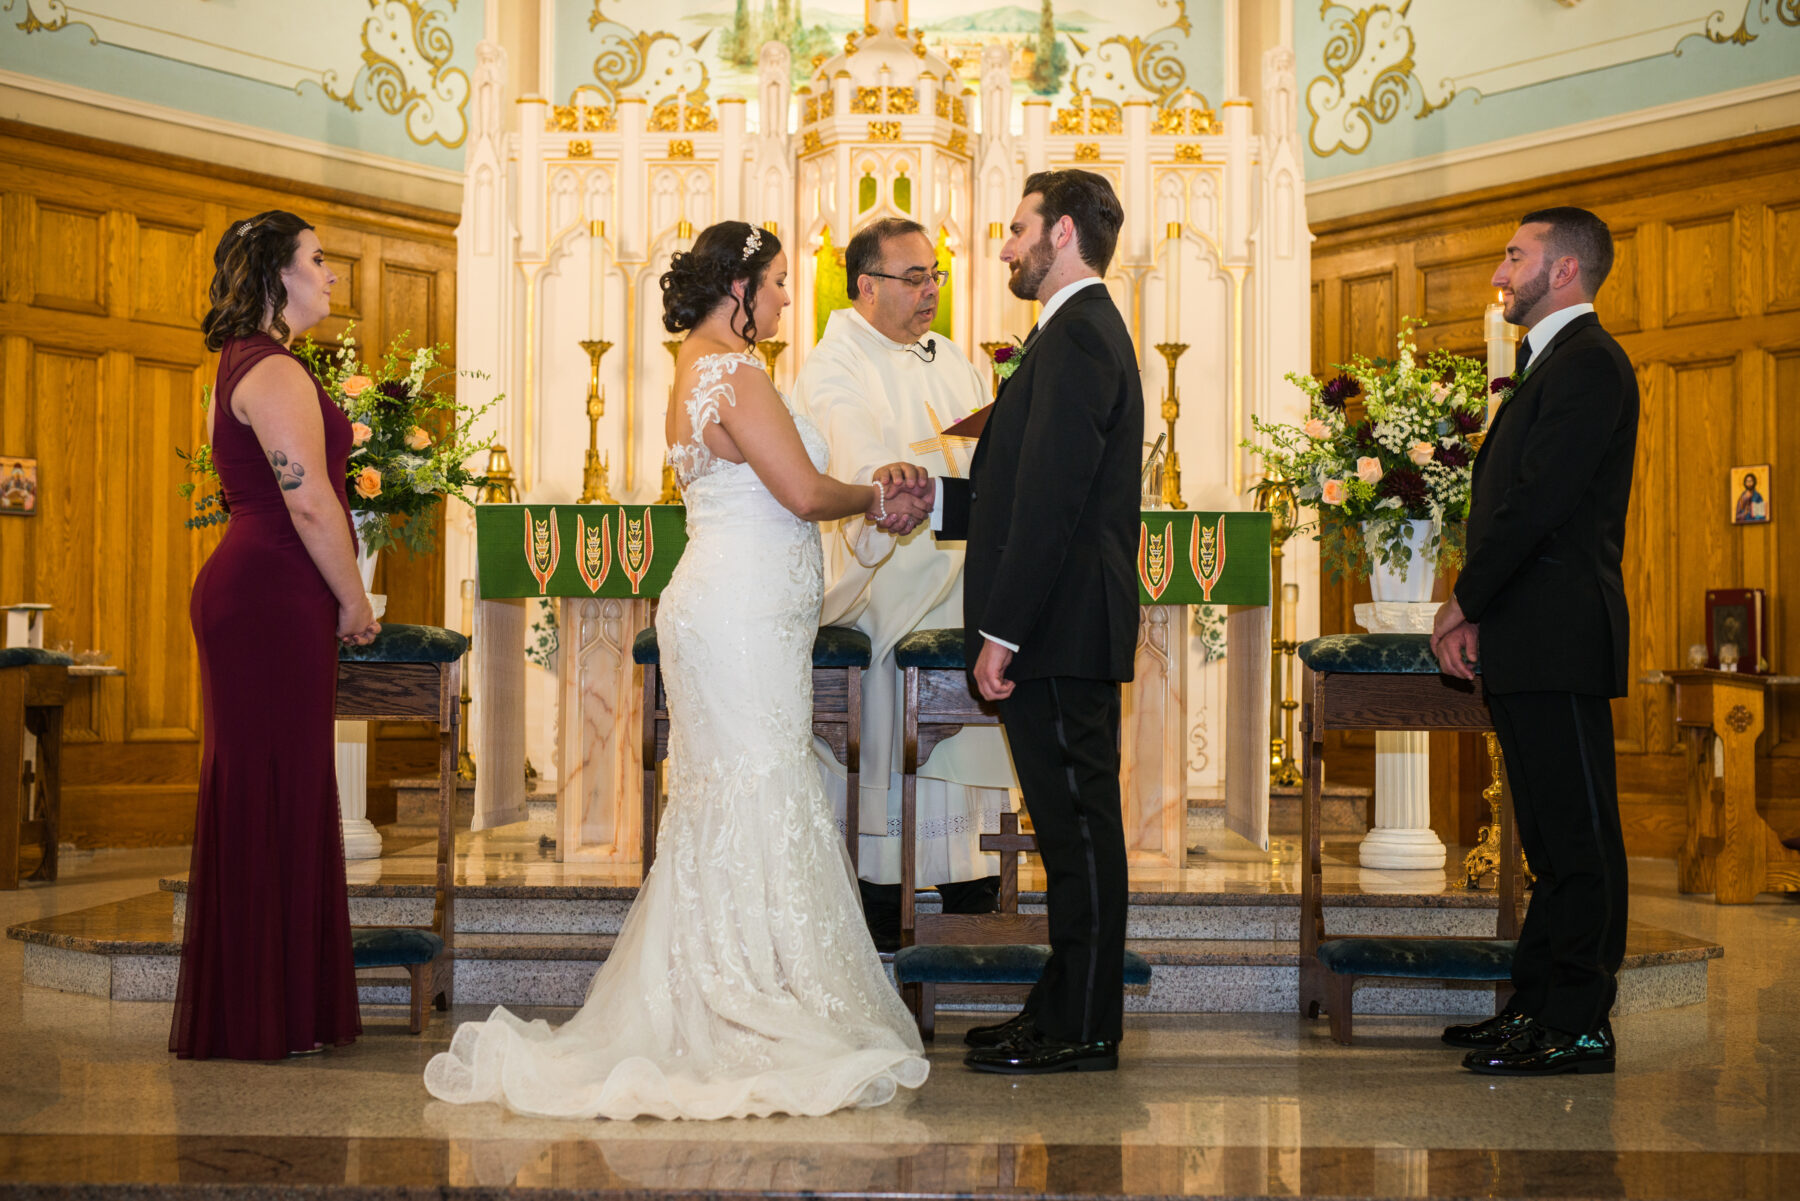 Rhodes on the Pawtuxet Cranston Wedding Carolyn and Tony Blueflash Photography 20